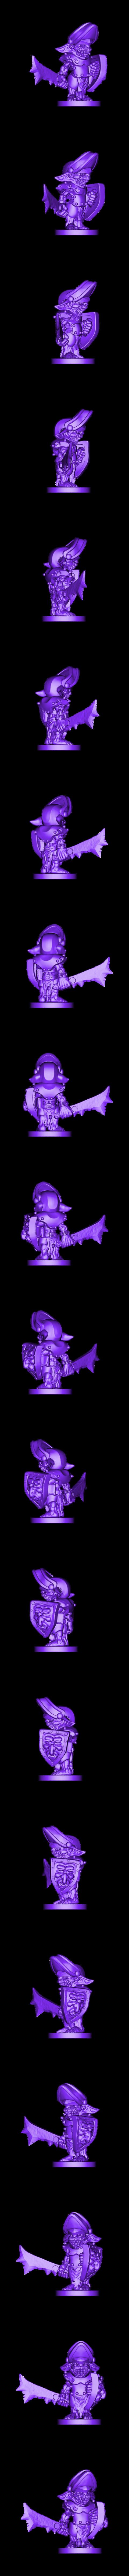 Armoured_Goblin2.stl Download free STL file Armoured Goblins • 3D printer model, duncanshadow